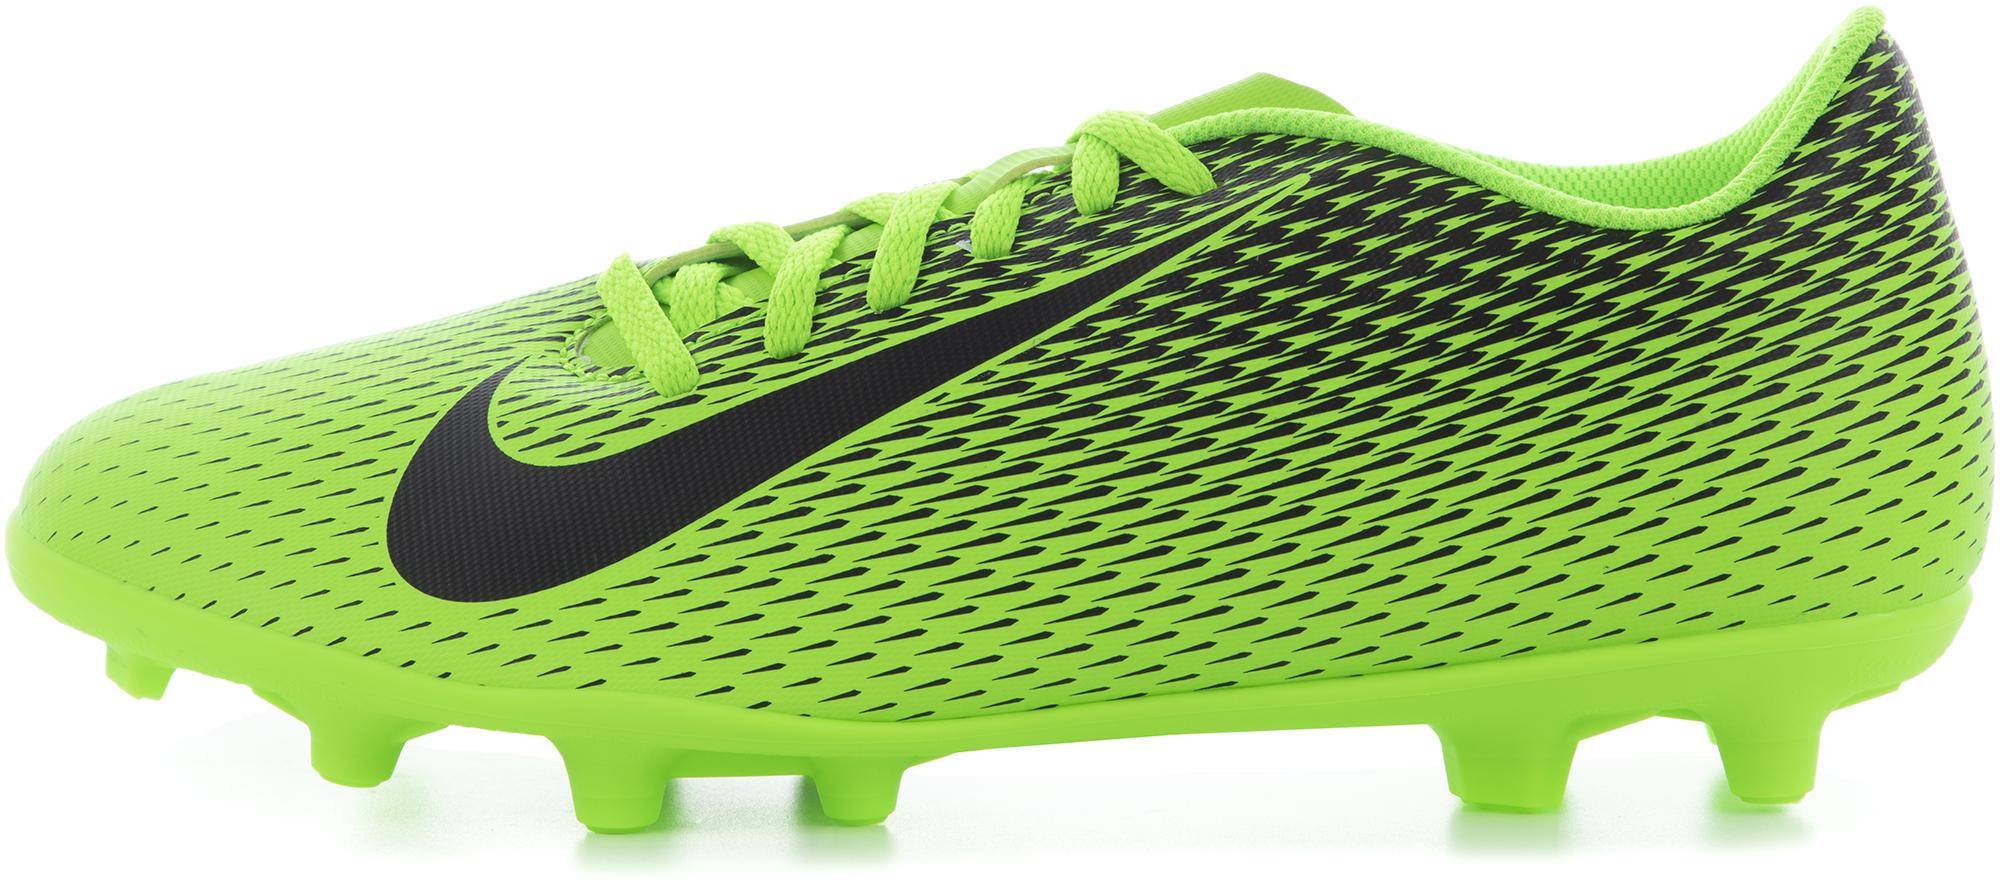 Nike Бутсы мужские Nike Bravata Ii Fg, размер 45 цена